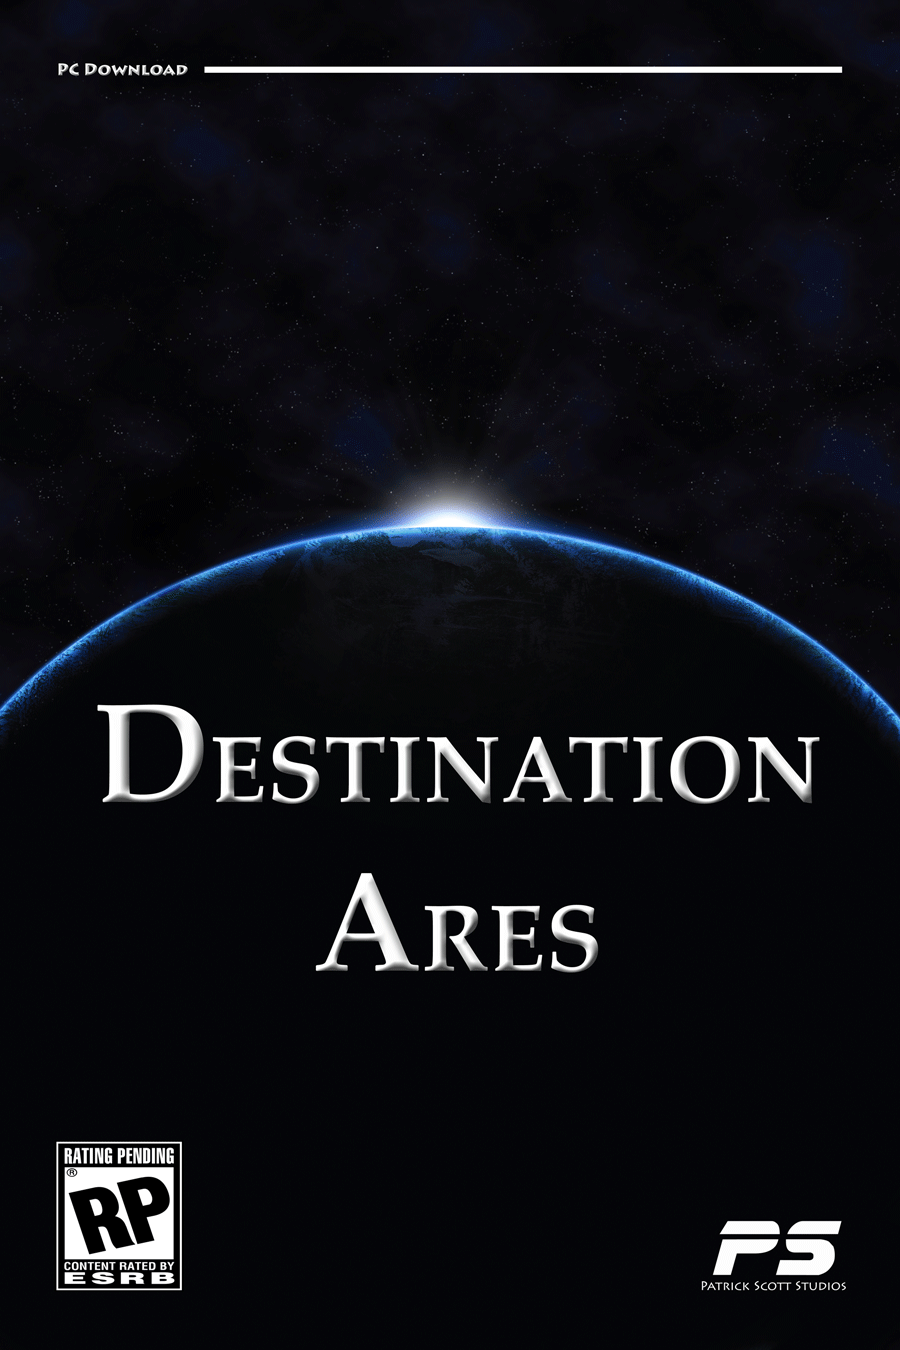 Destination-Ares